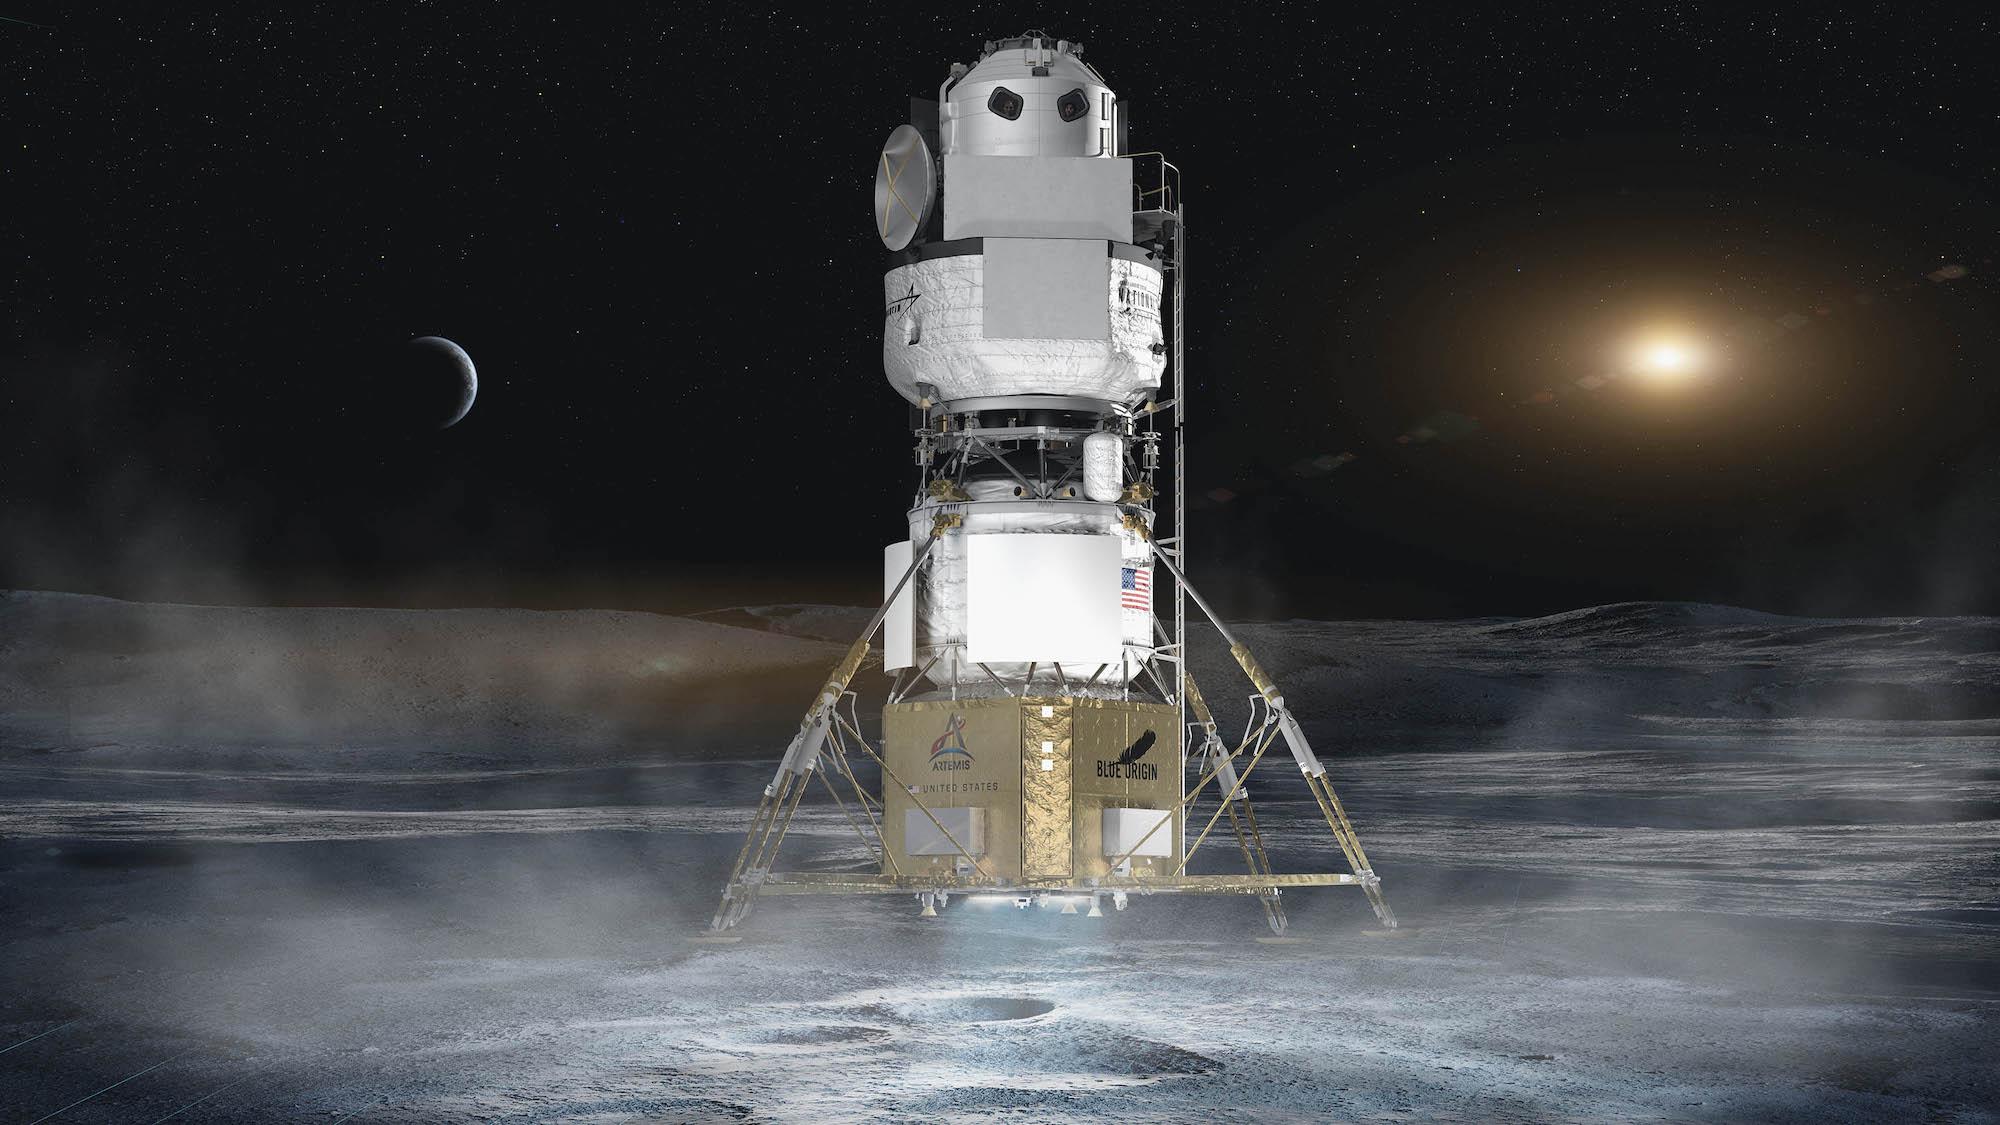 The national team's lunar lander combining Blue Origin, Lockheed Martin, Northrop Grumman and Draper Laboratory.  Credit: Blue Origin.